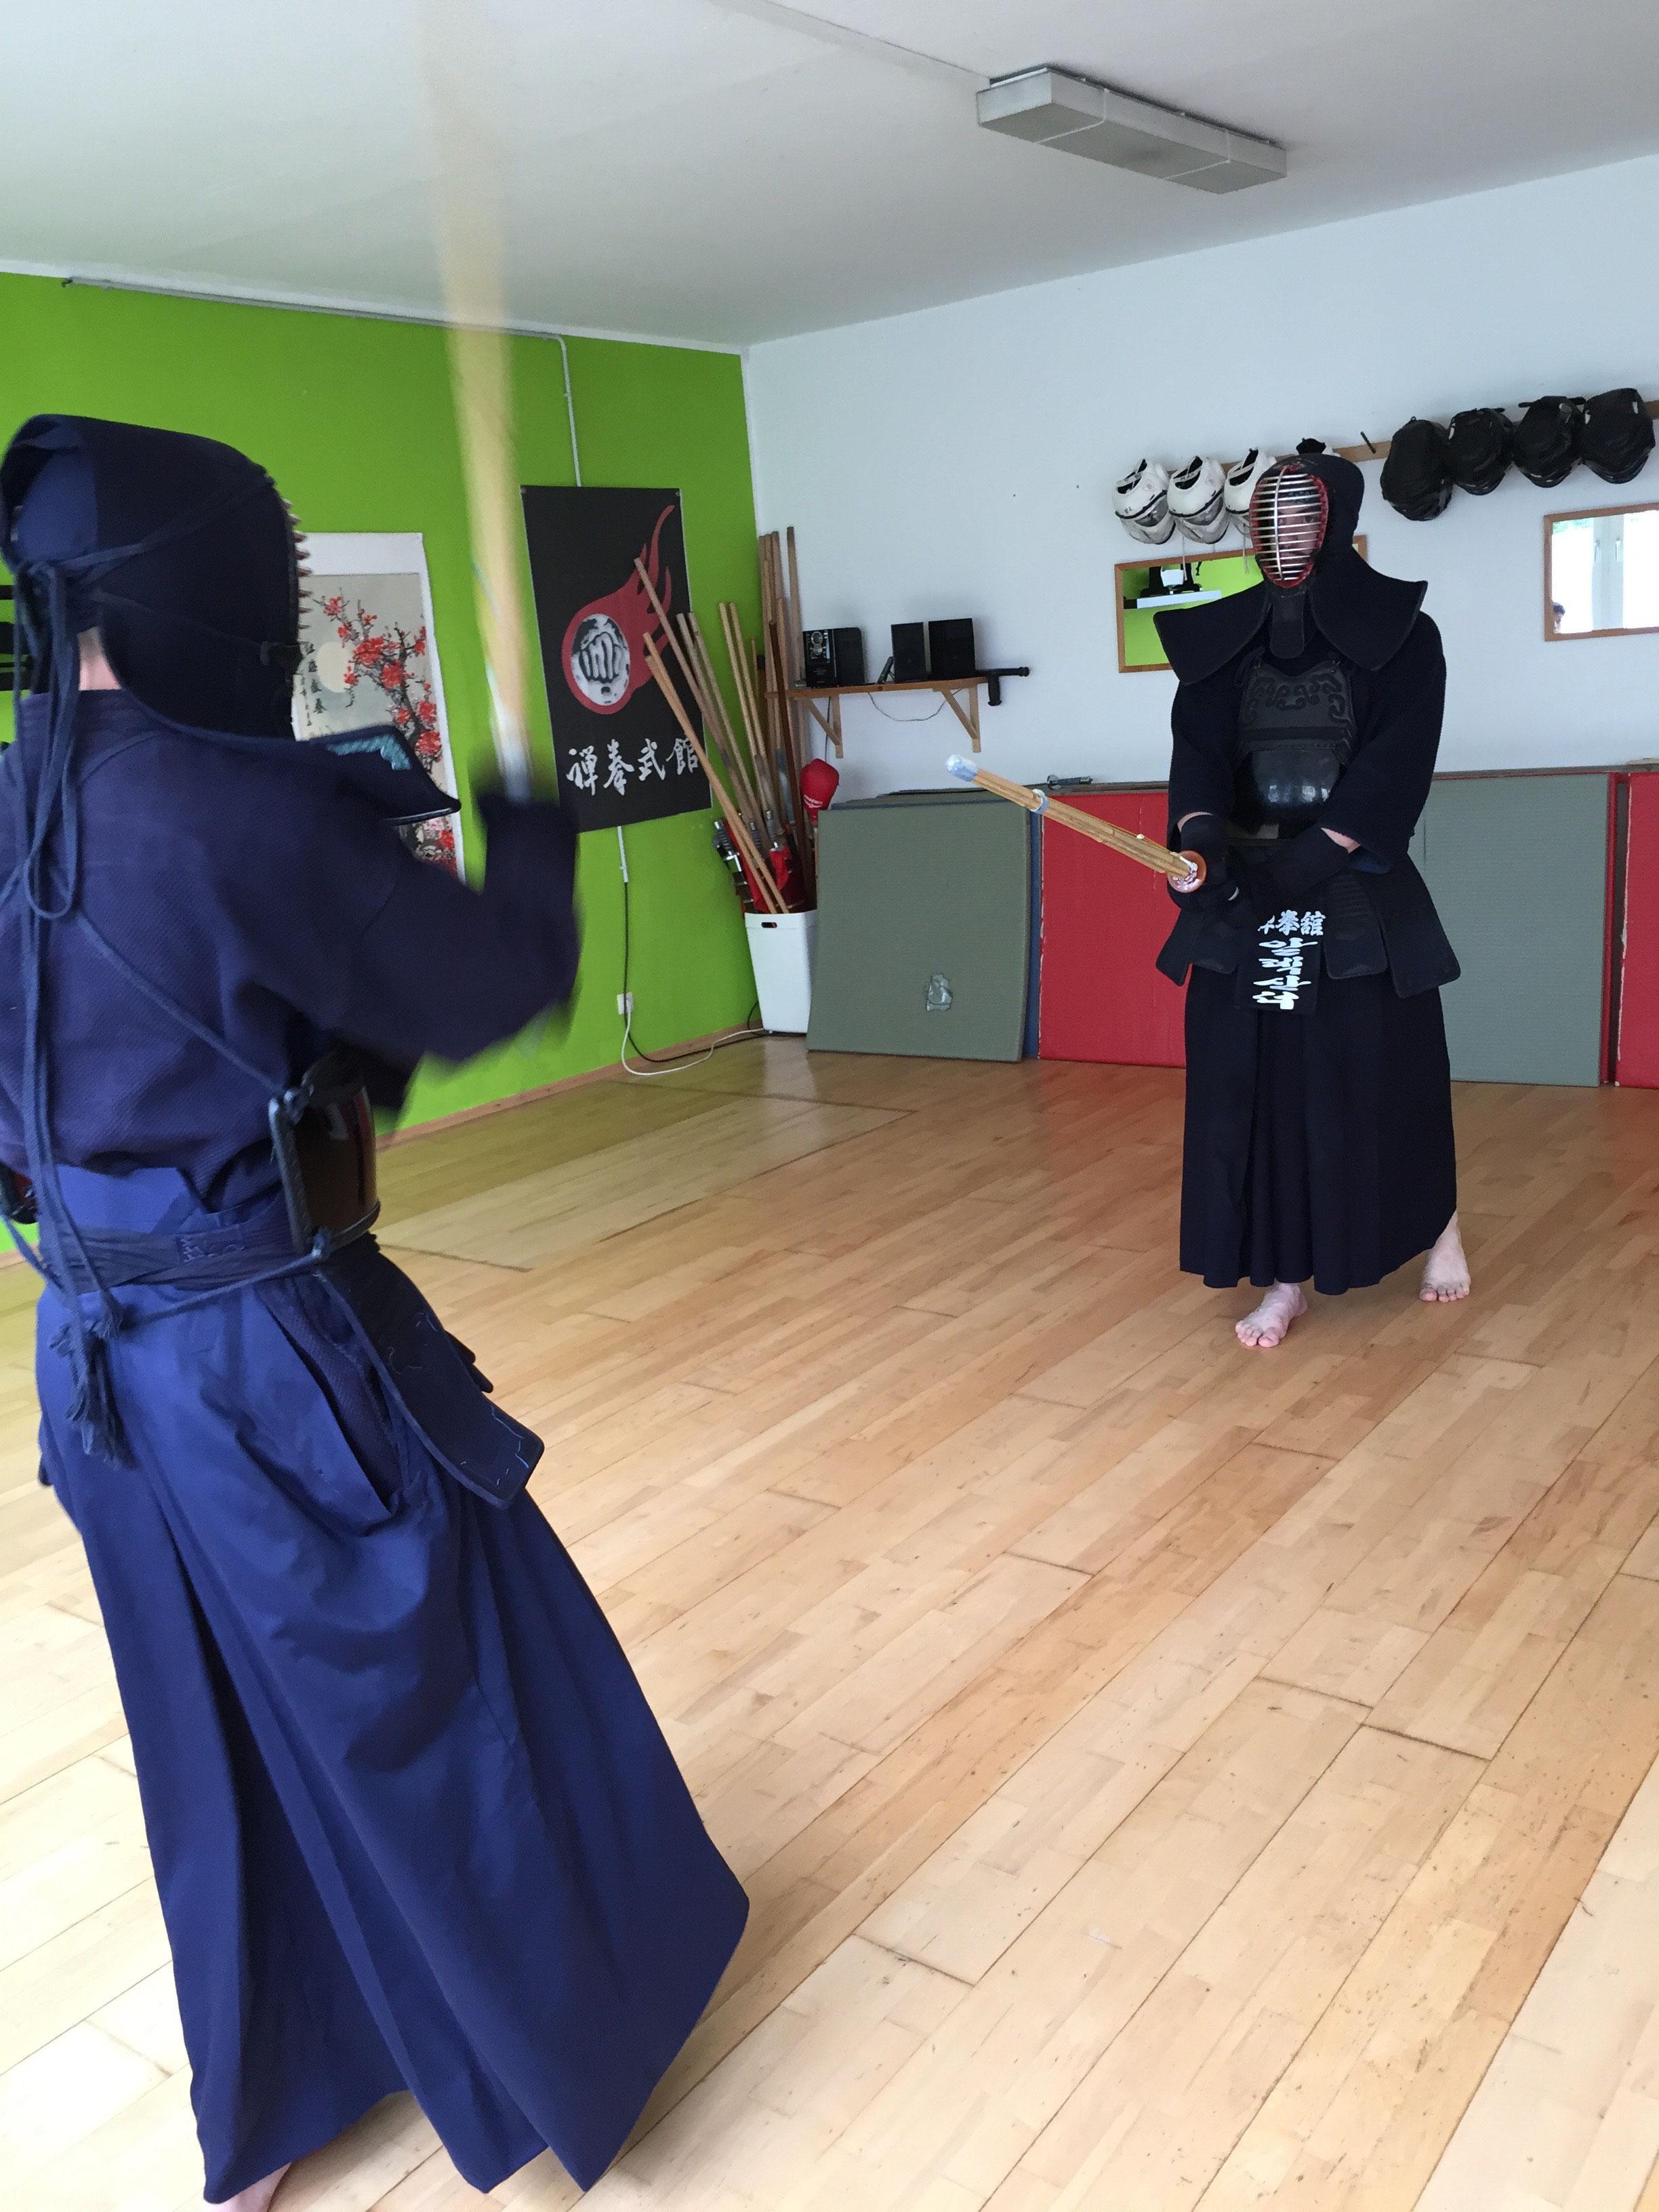 (c) Kampfsport-kwon.de